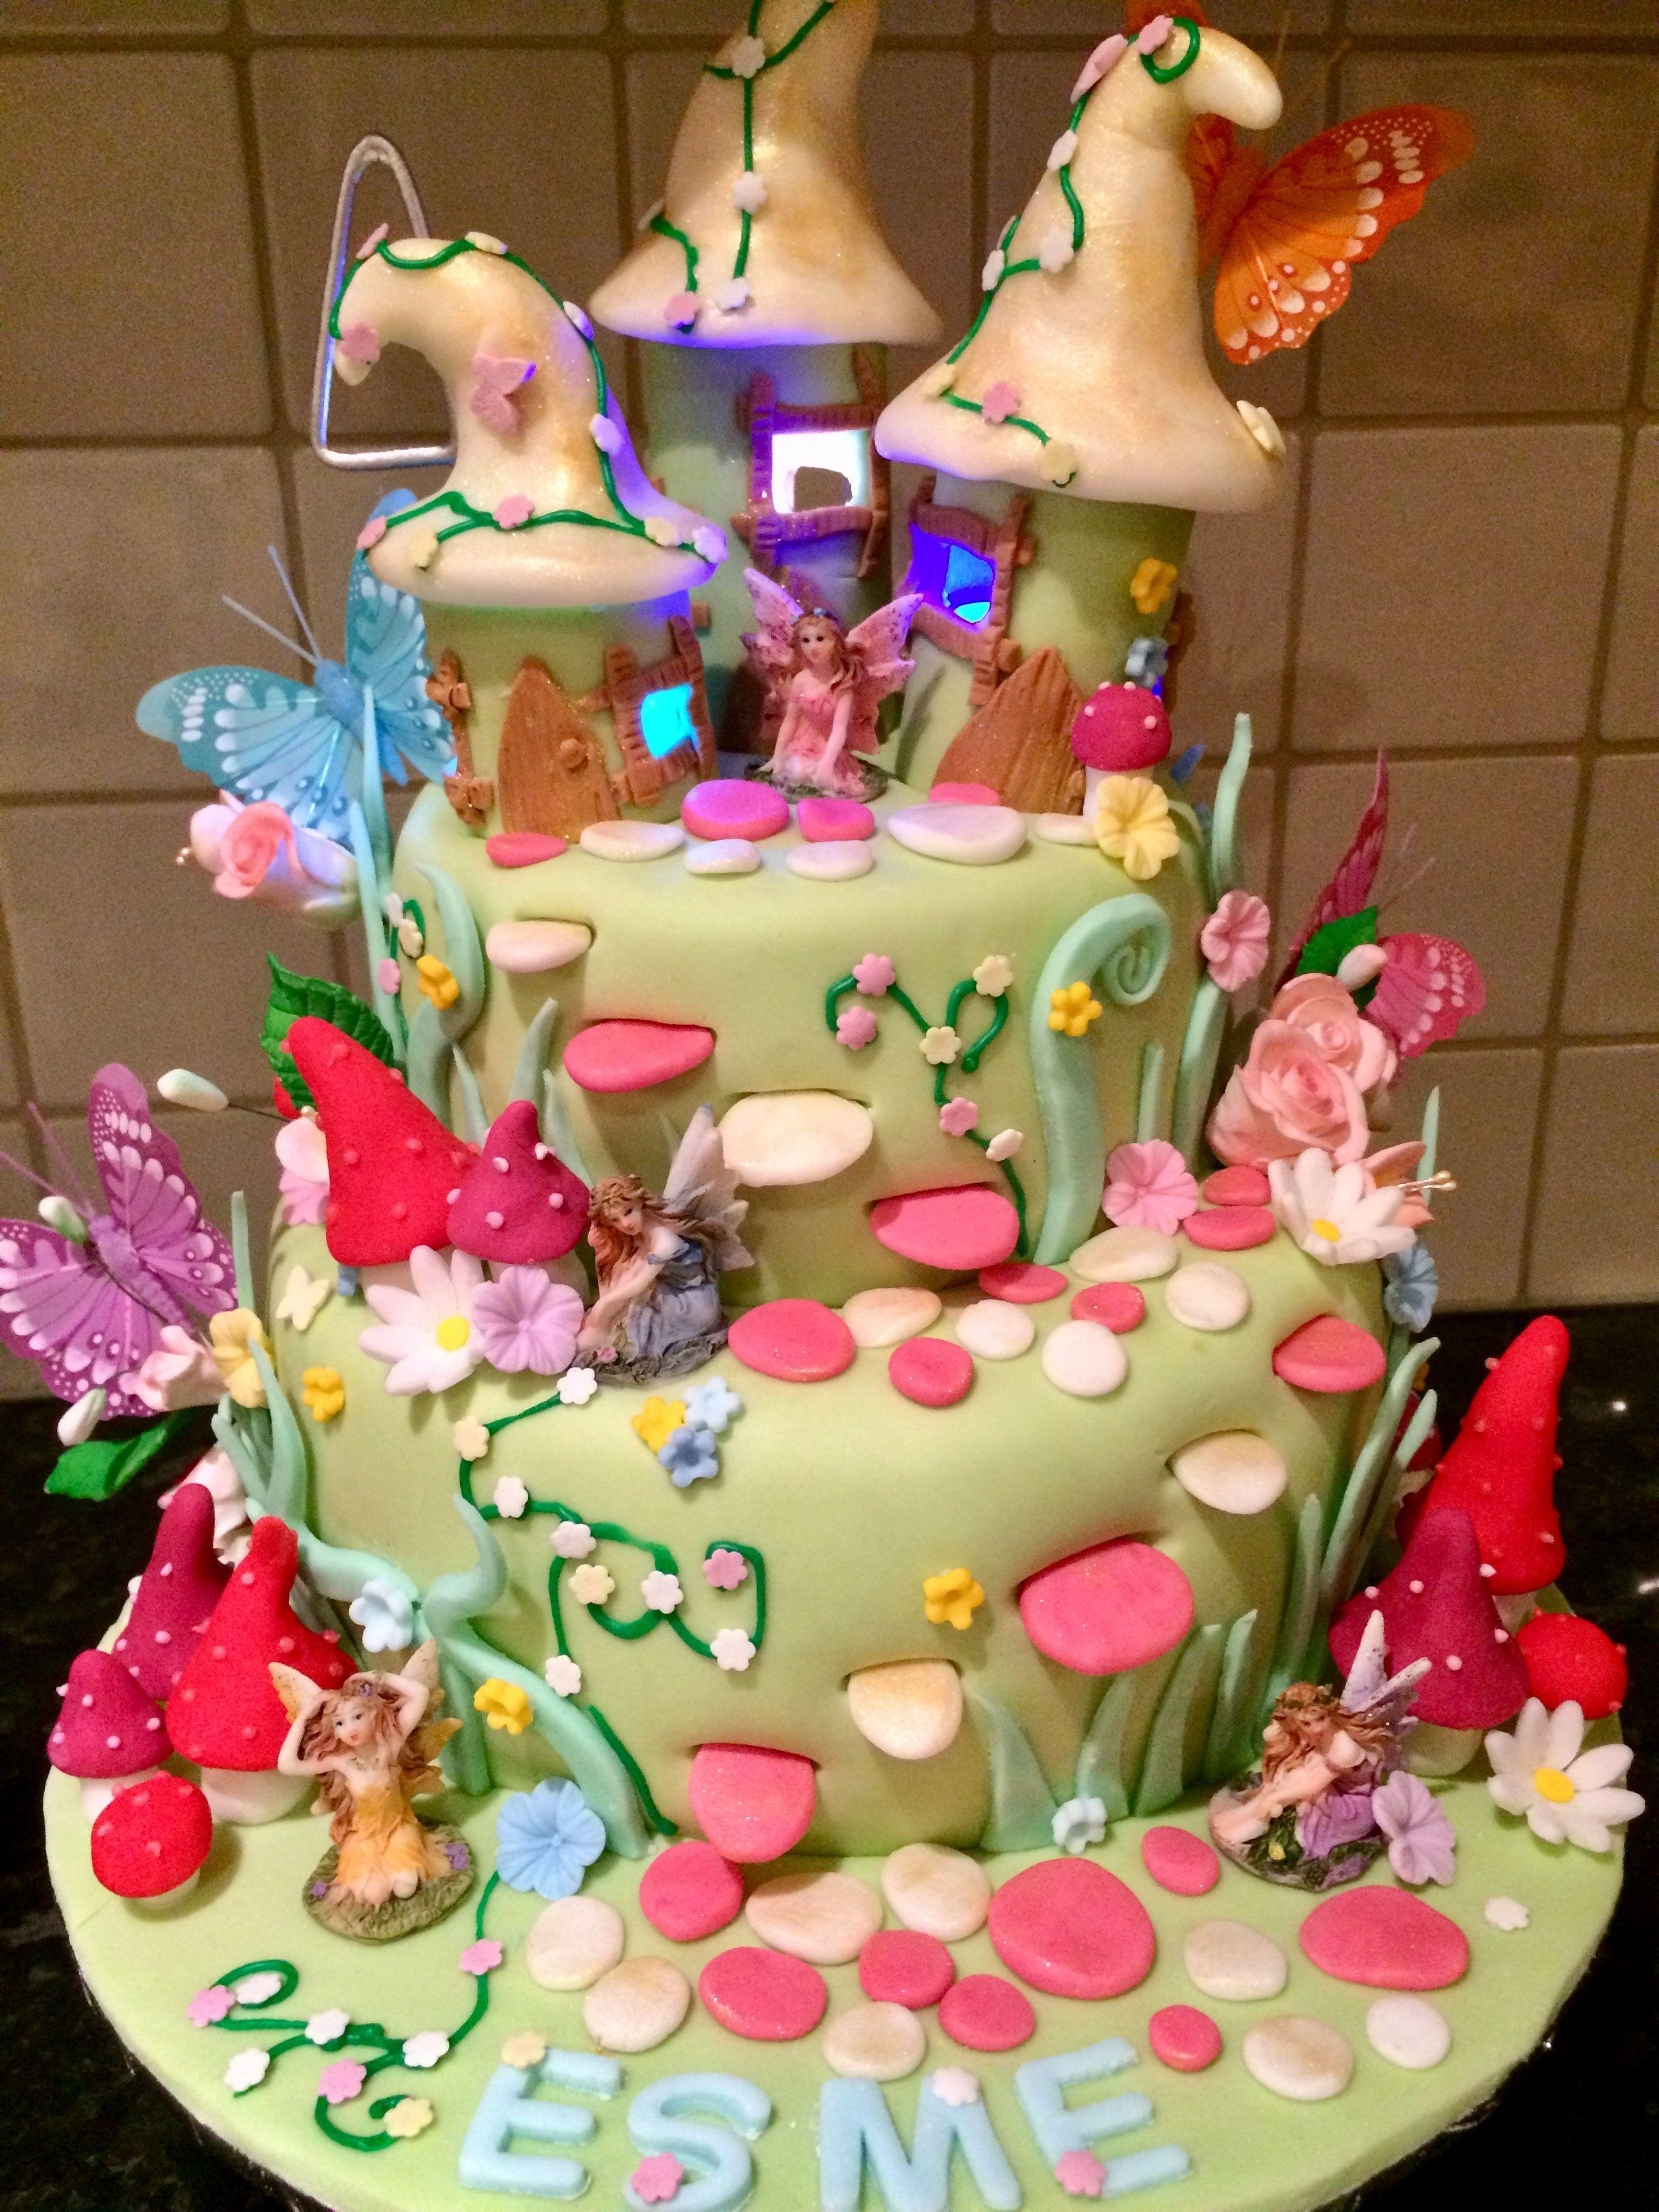 Enchanted Fairy Garden Birthday Cake With Light Up Fairy Houses